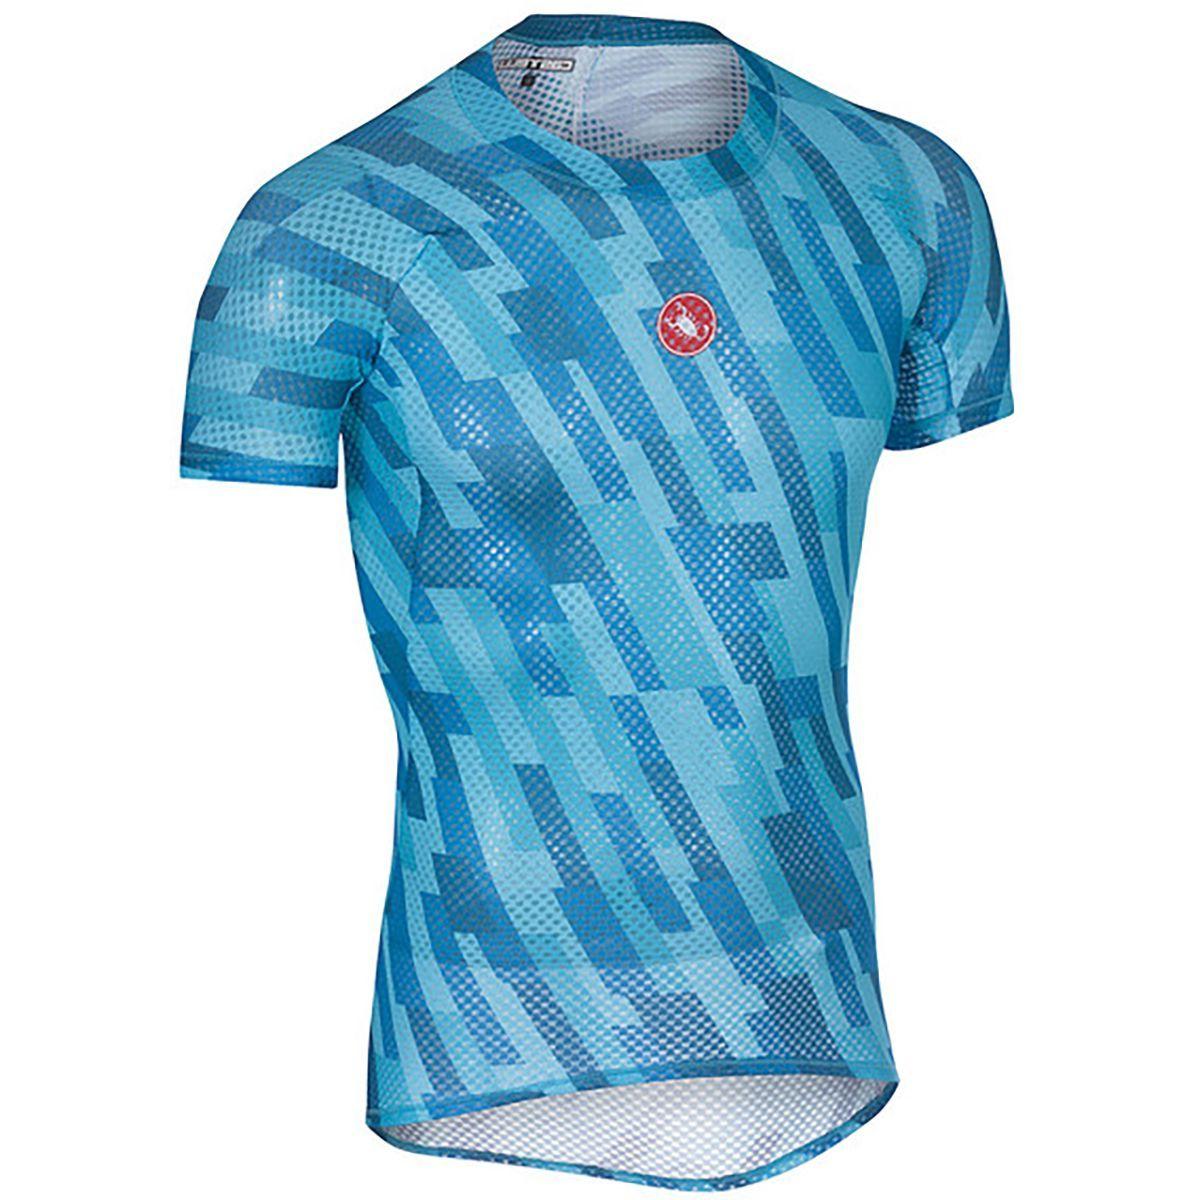 Castelli Pro Mesh Short Sleeve Base Layer - Men's